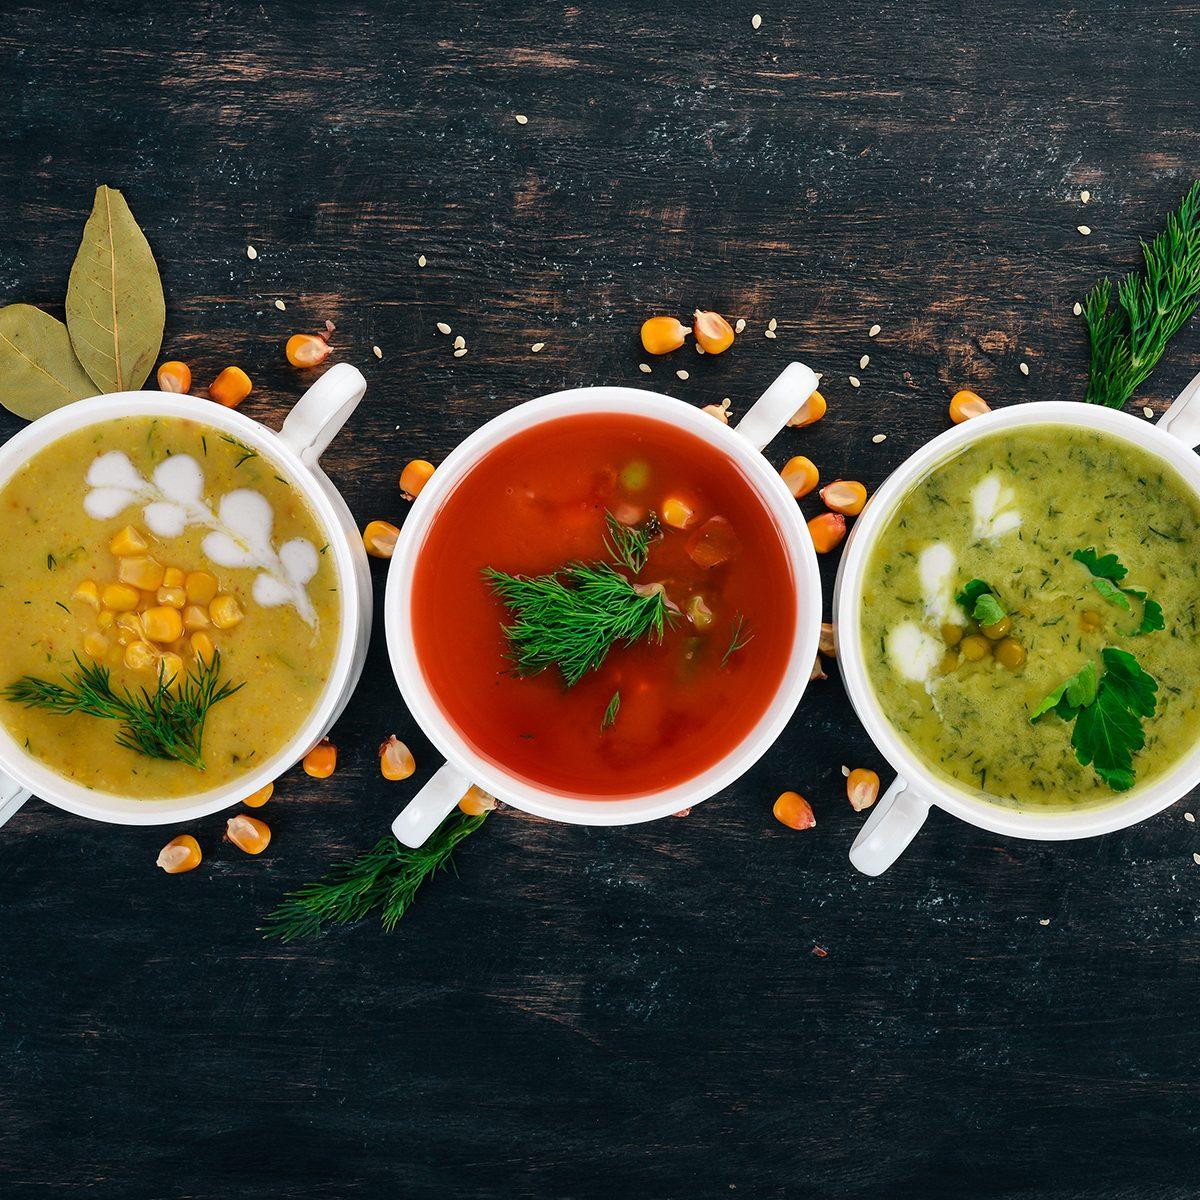 Set of hot, colored vegetable soups. Broccoli soup, corn, tomato soup.